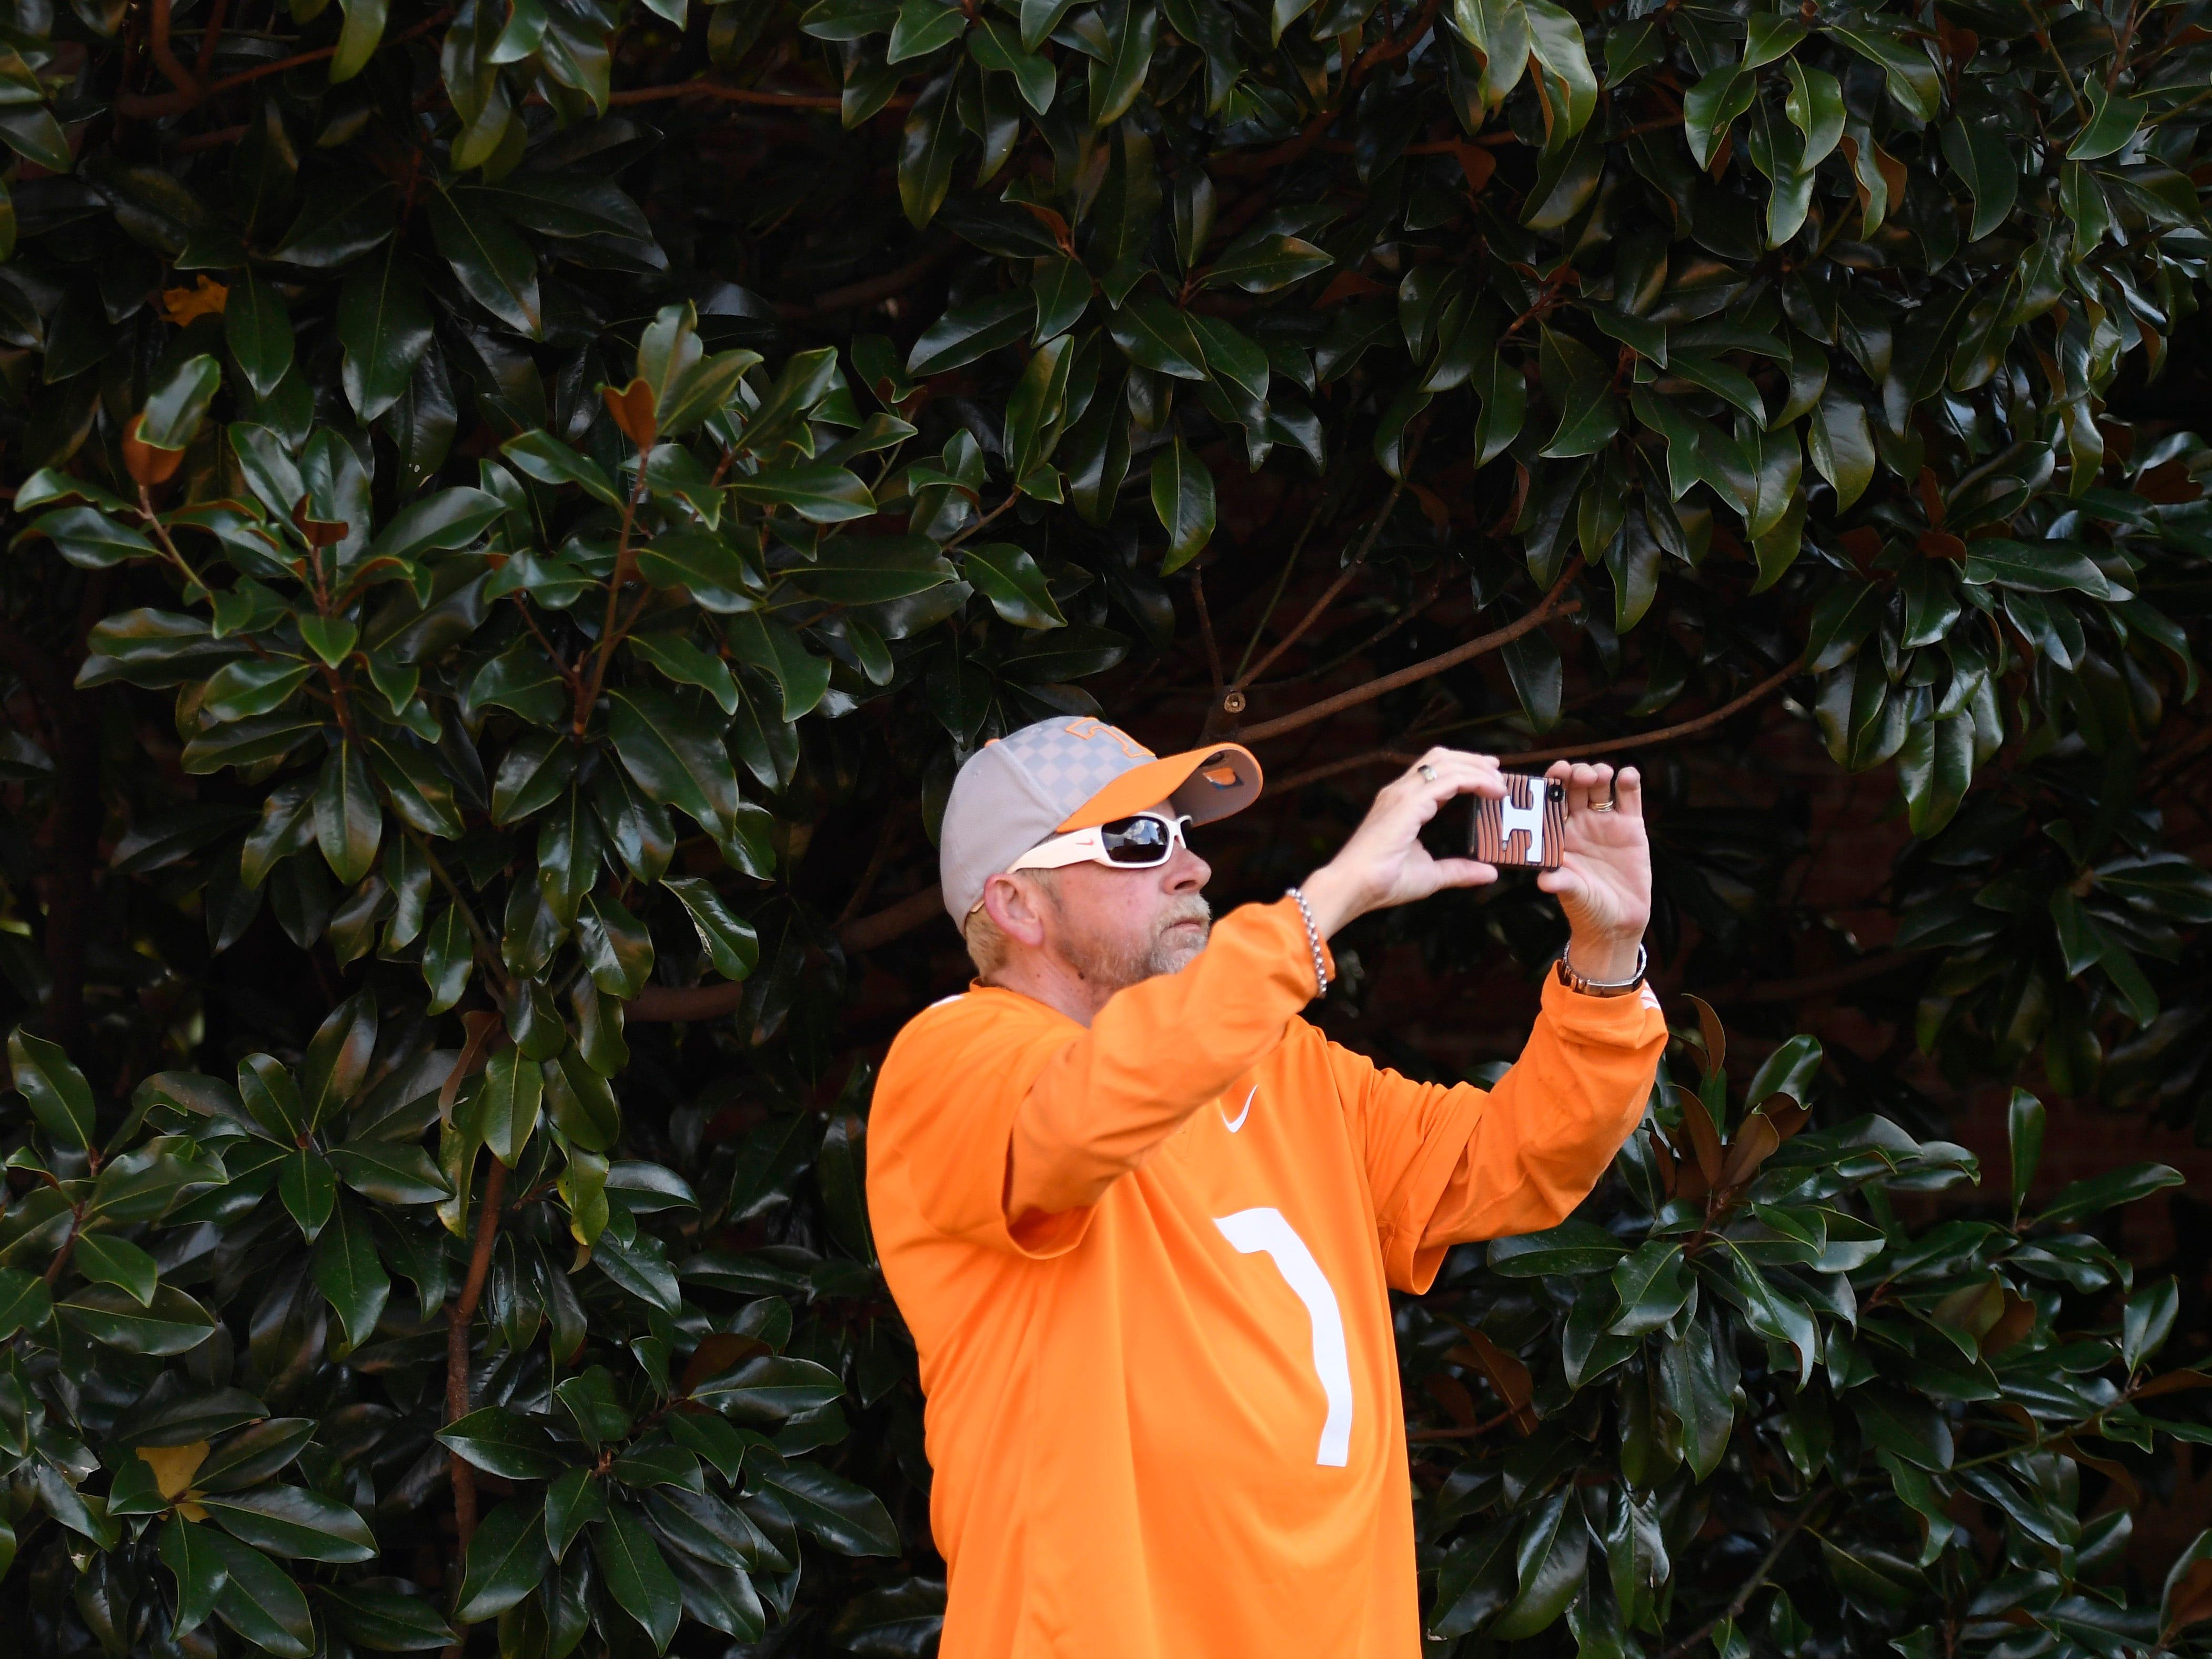 Tim Keen of Gallatin is dressed in Tennessee colors before the game at Vanderbilt Stadium Saturday, Nov. 24, 2018, in Nashville, Tenn.